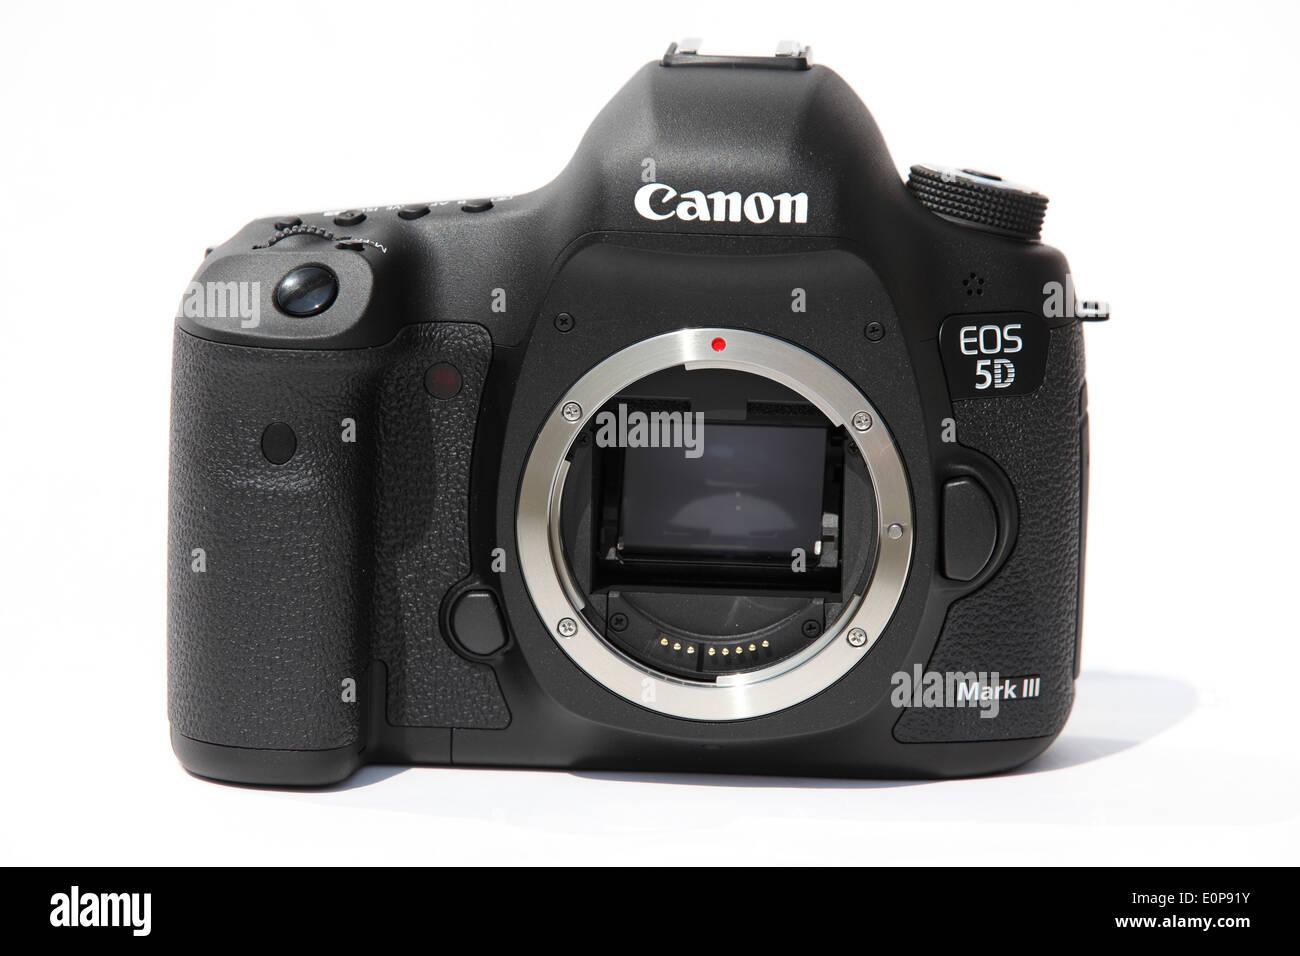 A Canon 5D Mark III digital single lens reflex (SLR) camera. - Stock Image